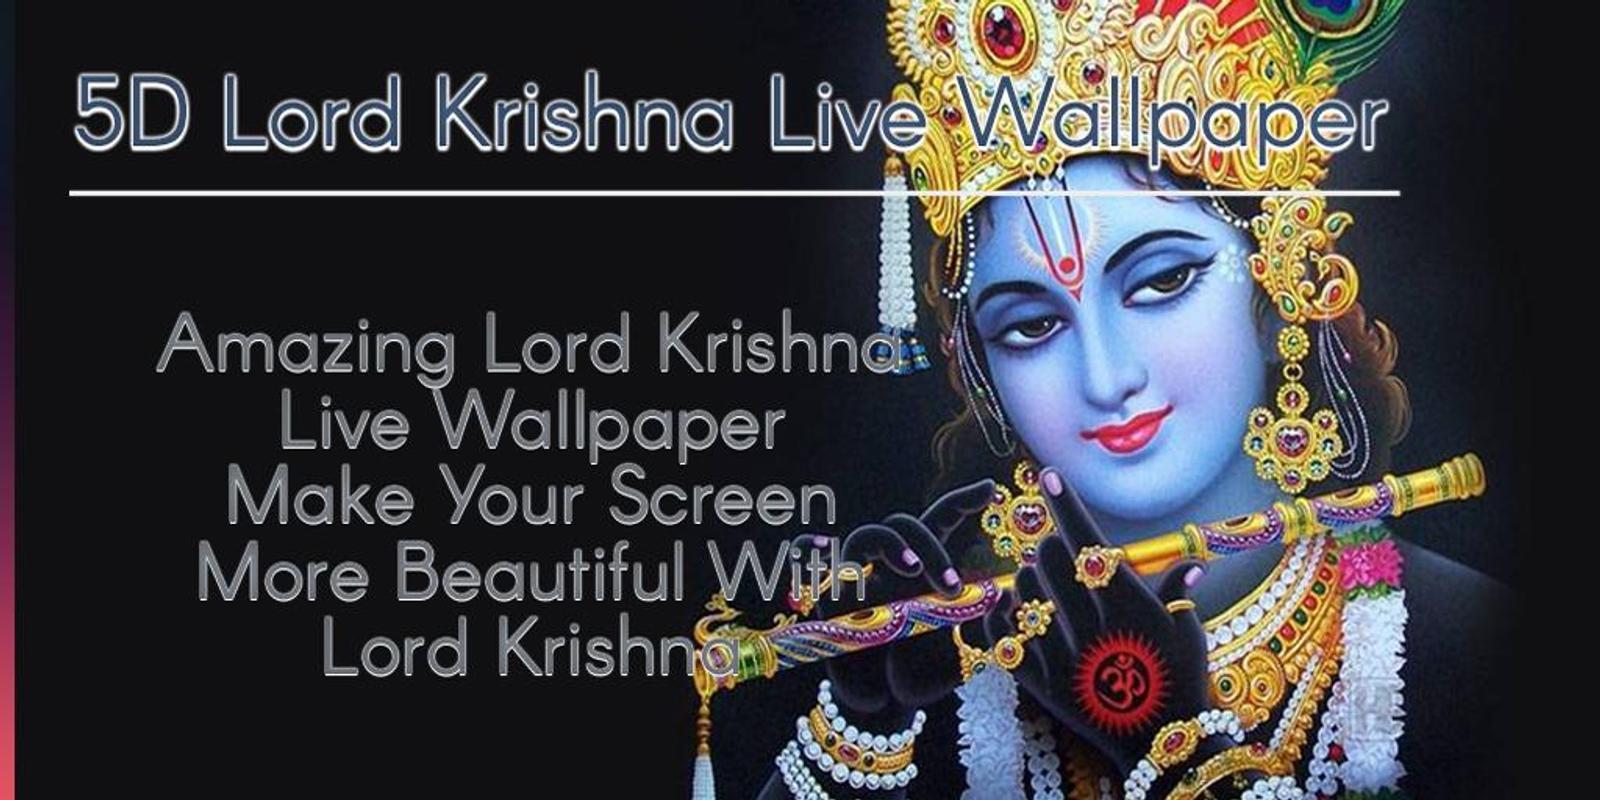 5D Lord Krishna Live Wallpaper安卓下载,安卓版APK